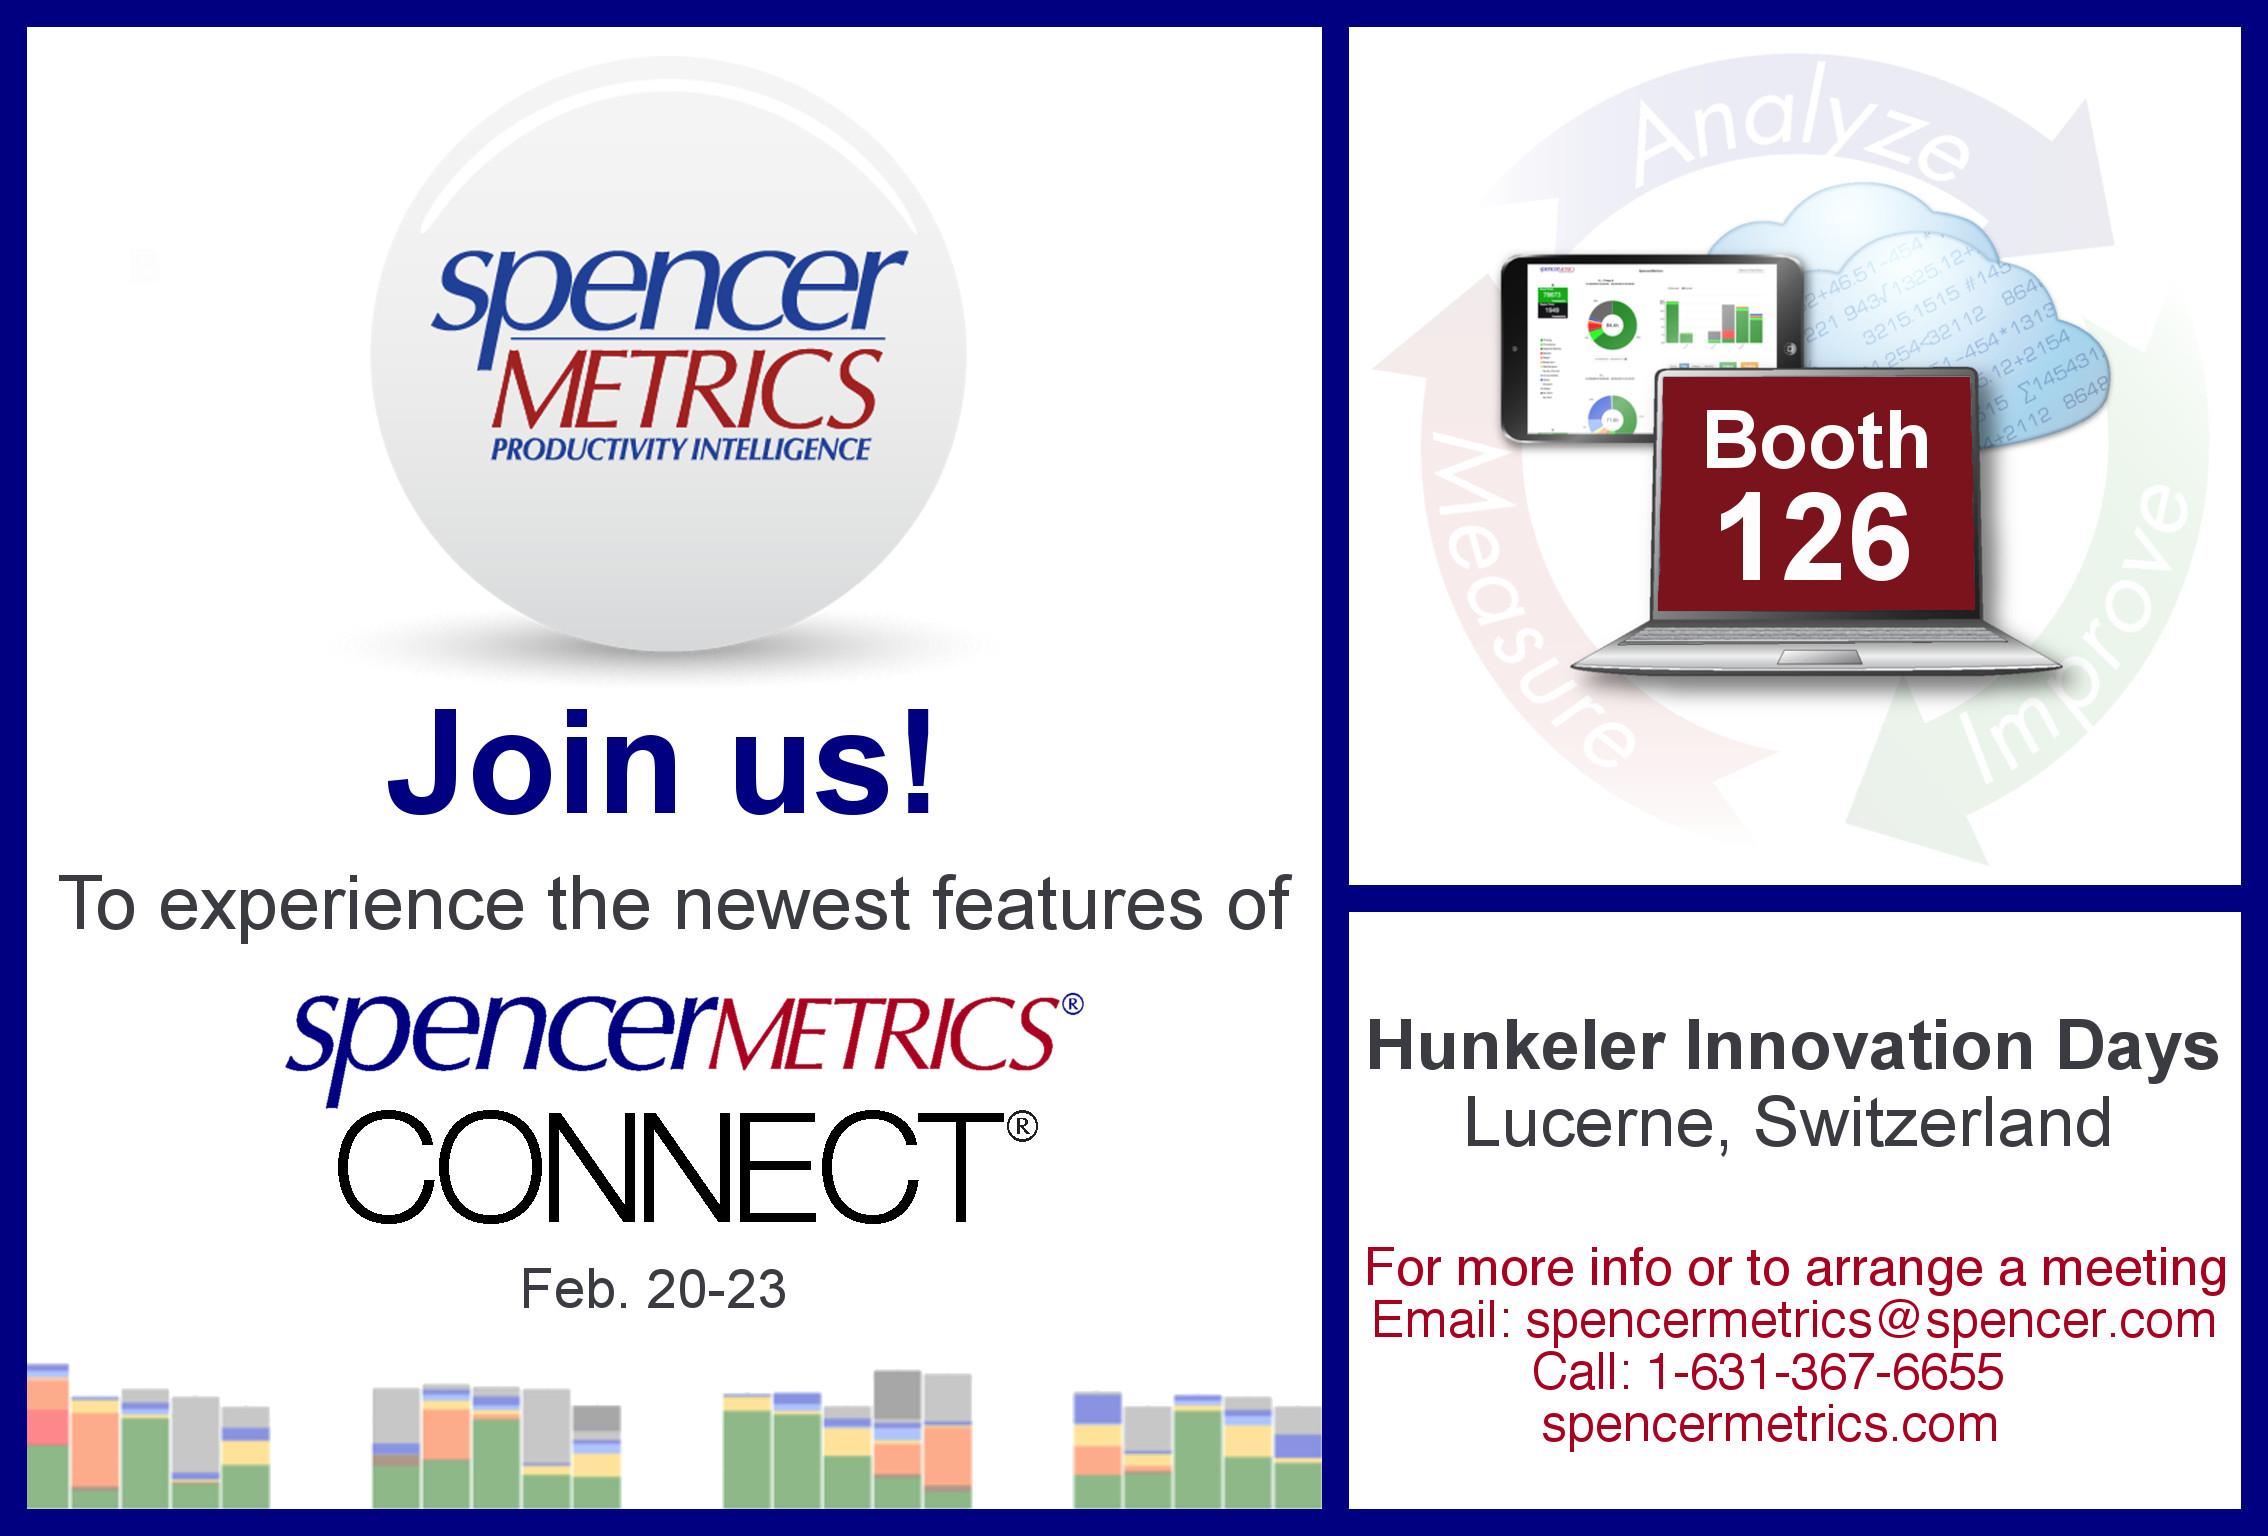 SpencerMetrics Hunkeler Invite